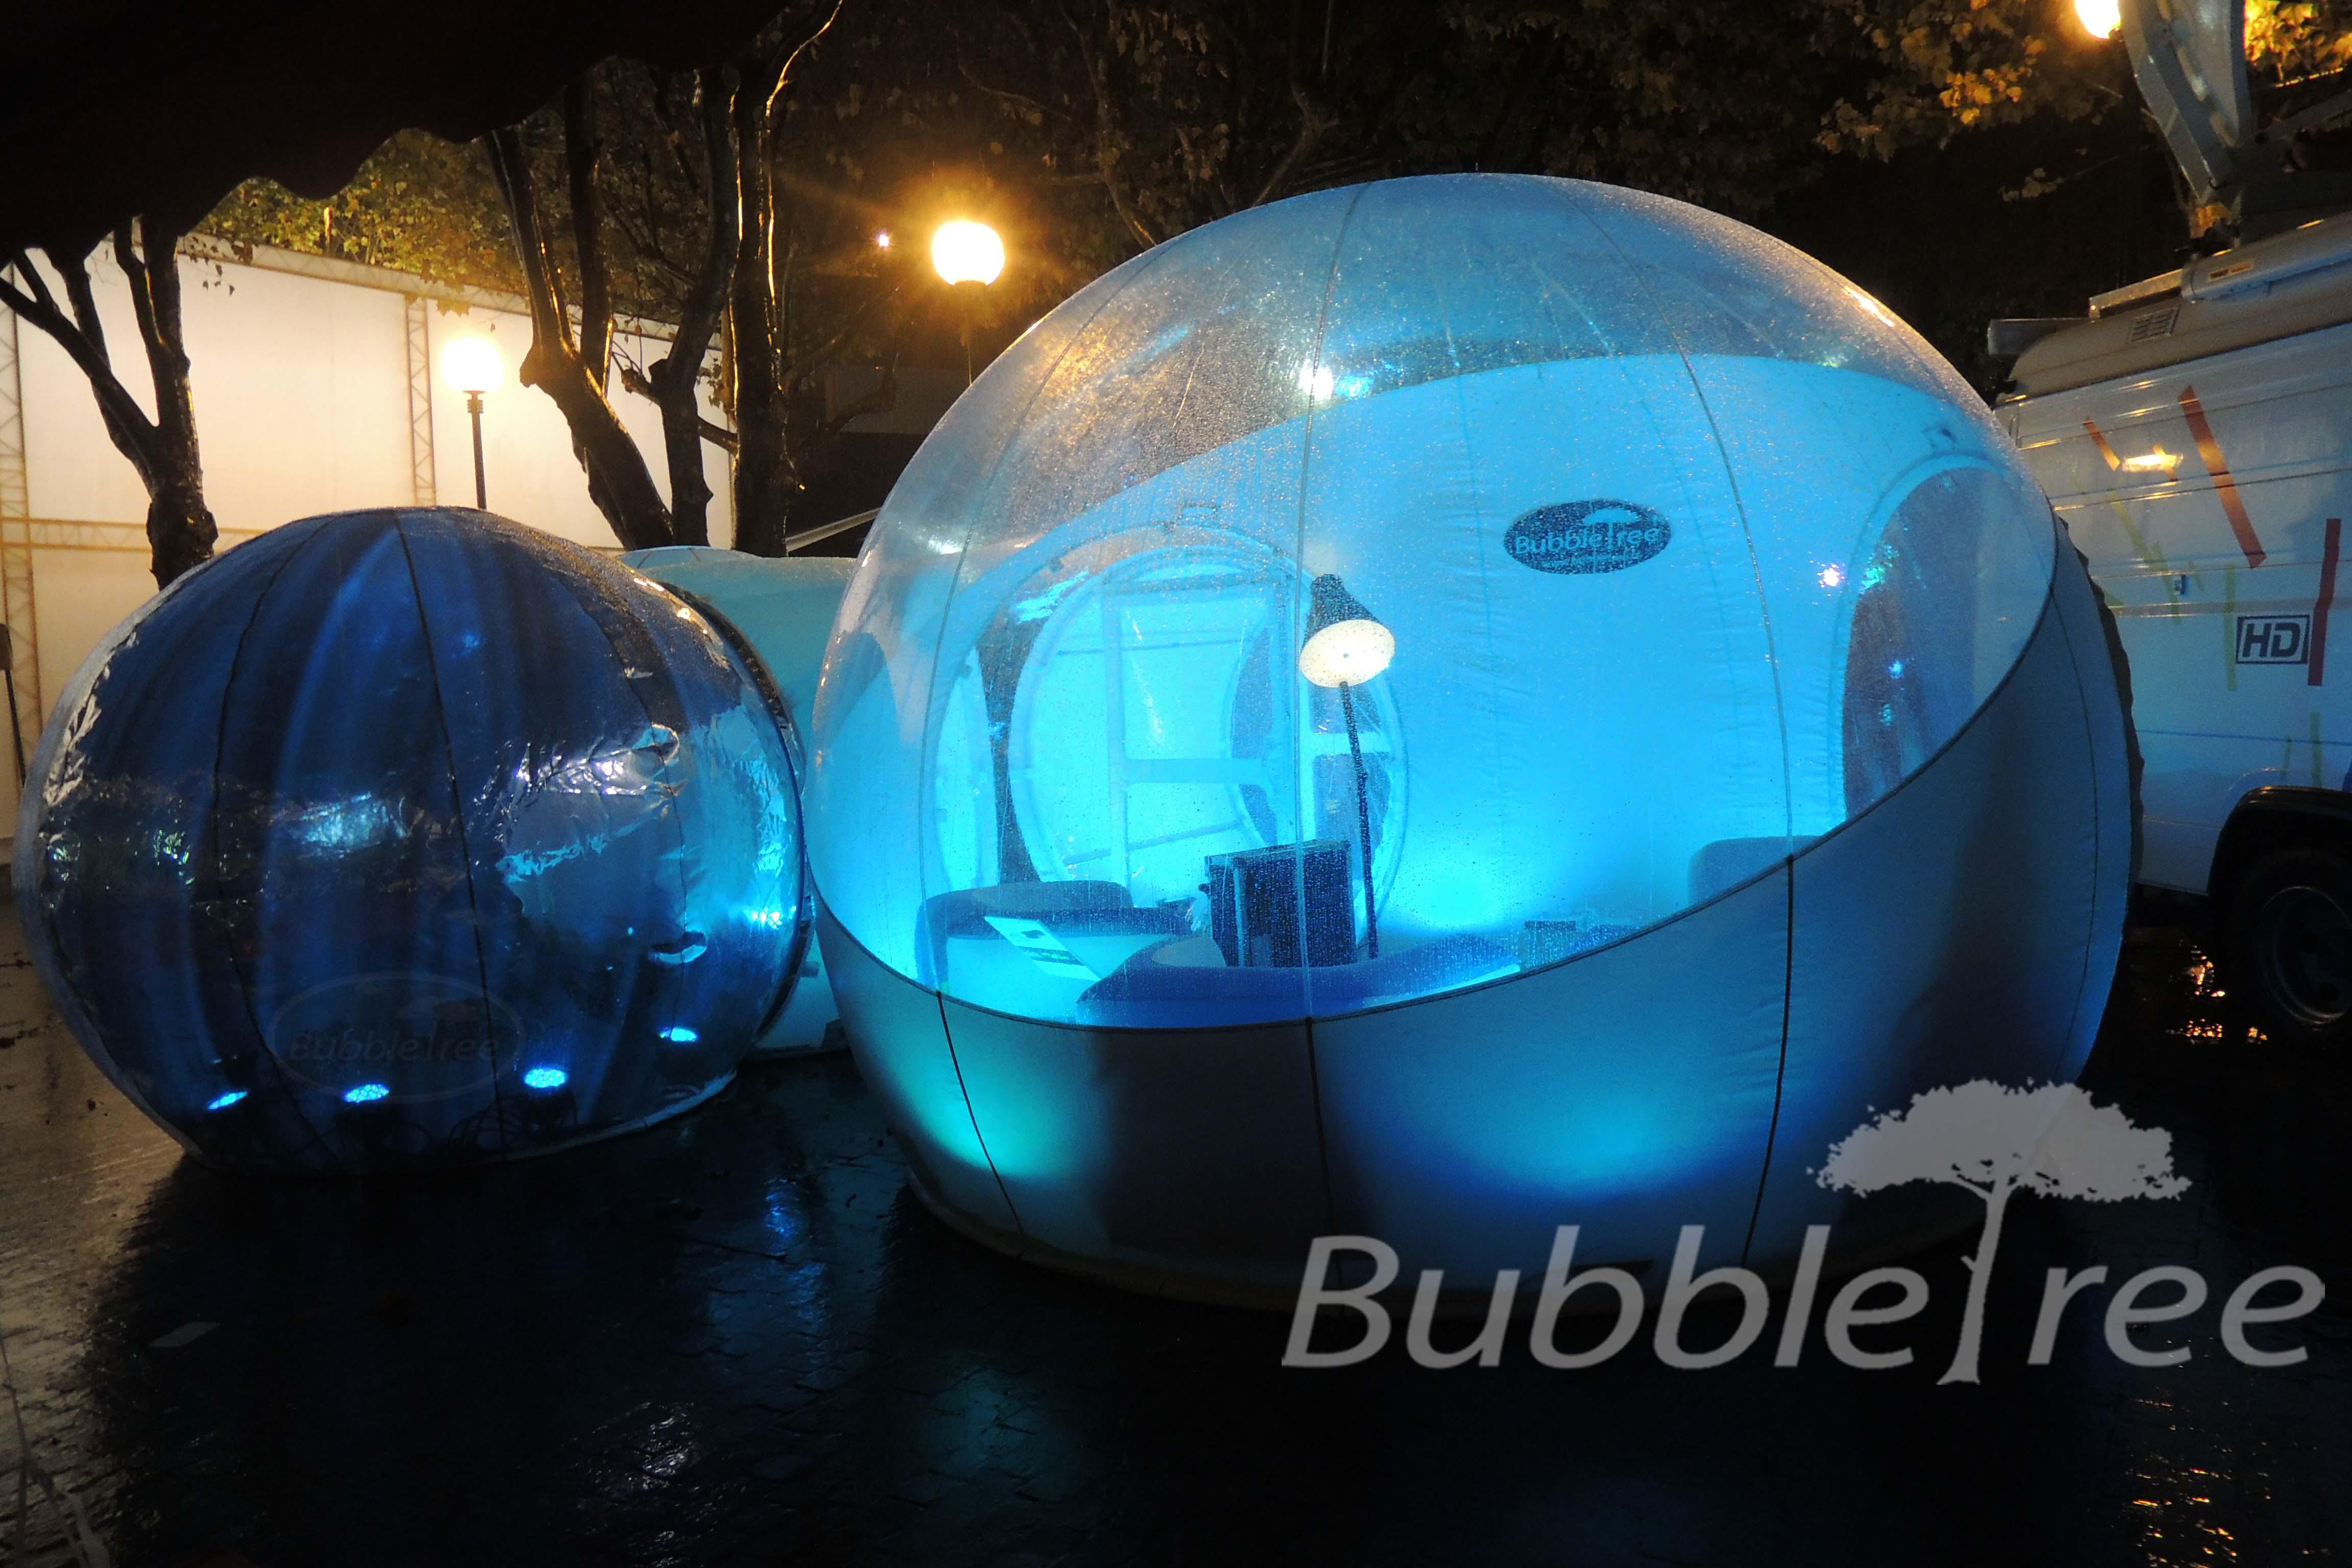 heavent 2014 bubble tree. Black Bedroom Furniture Sets. Home Design Ideas